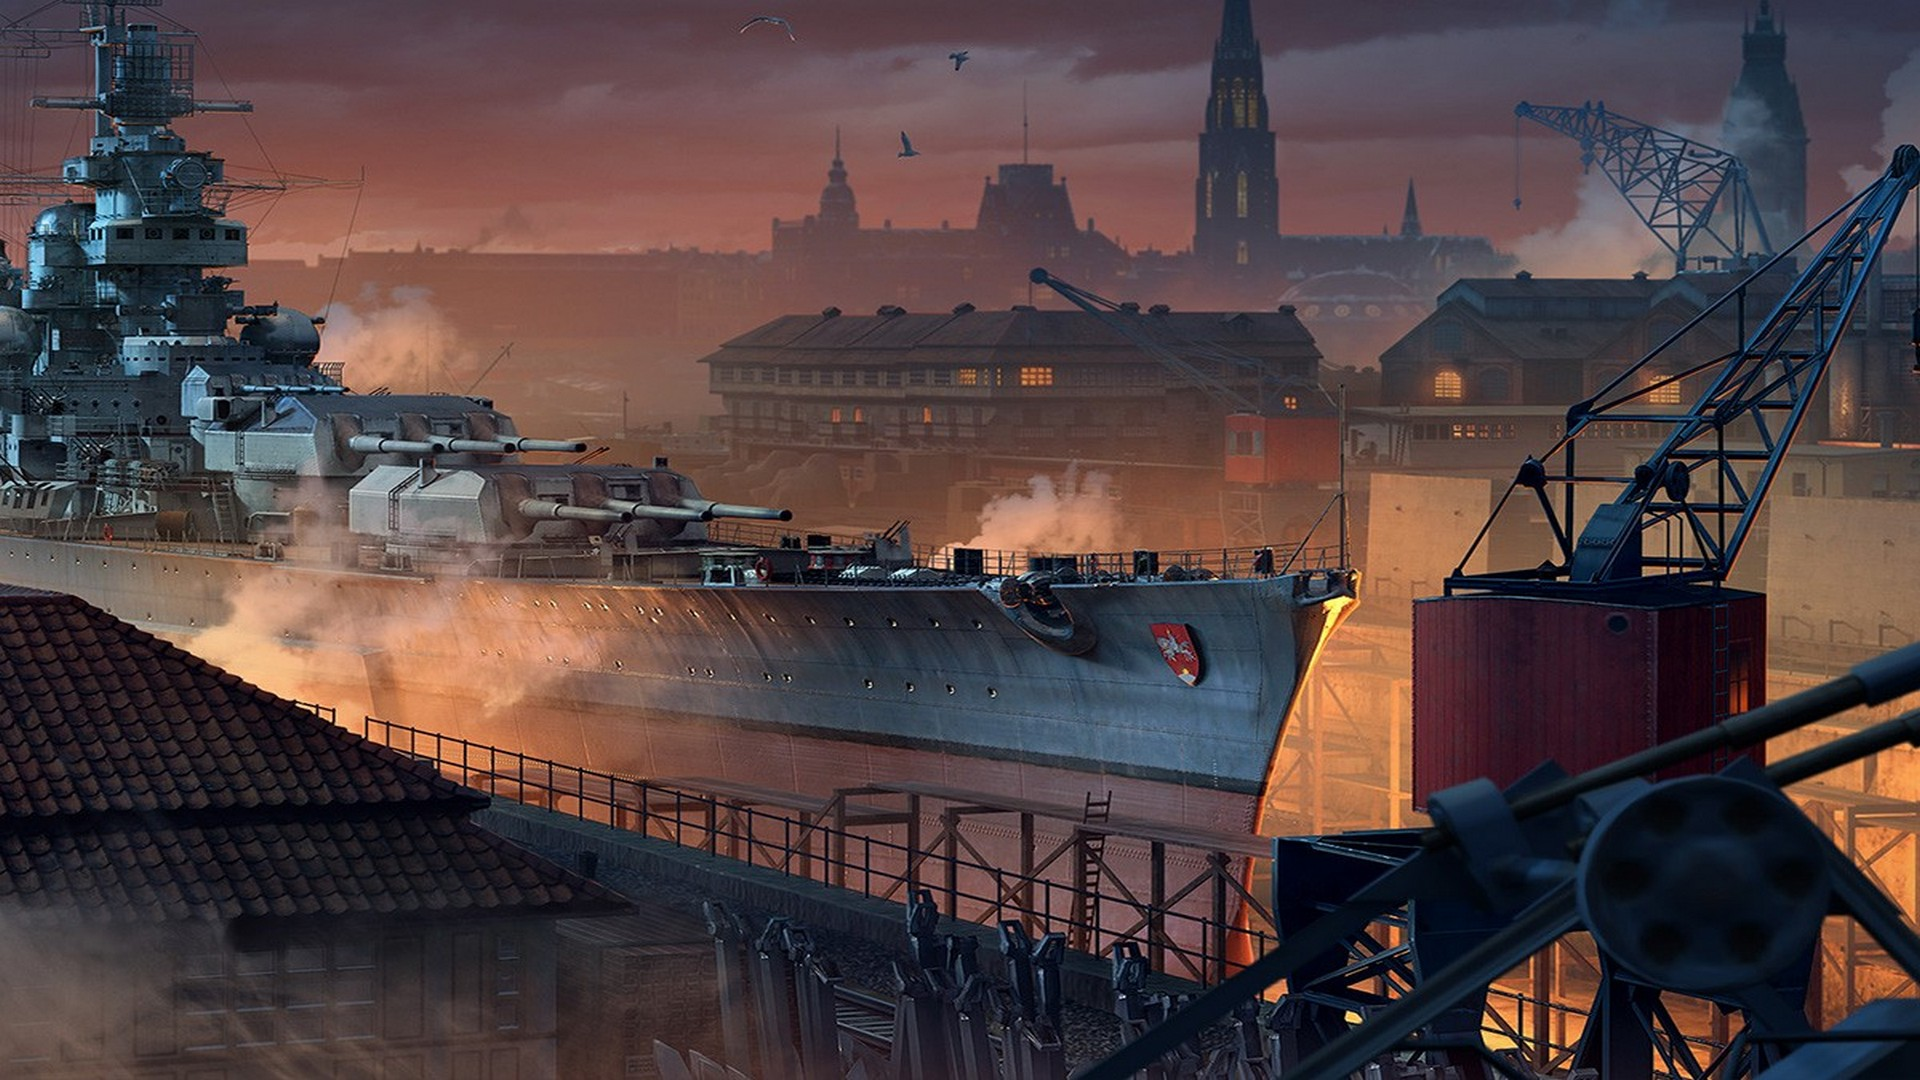 New Hamburg Dockyard Ready To Construct In World of Warships